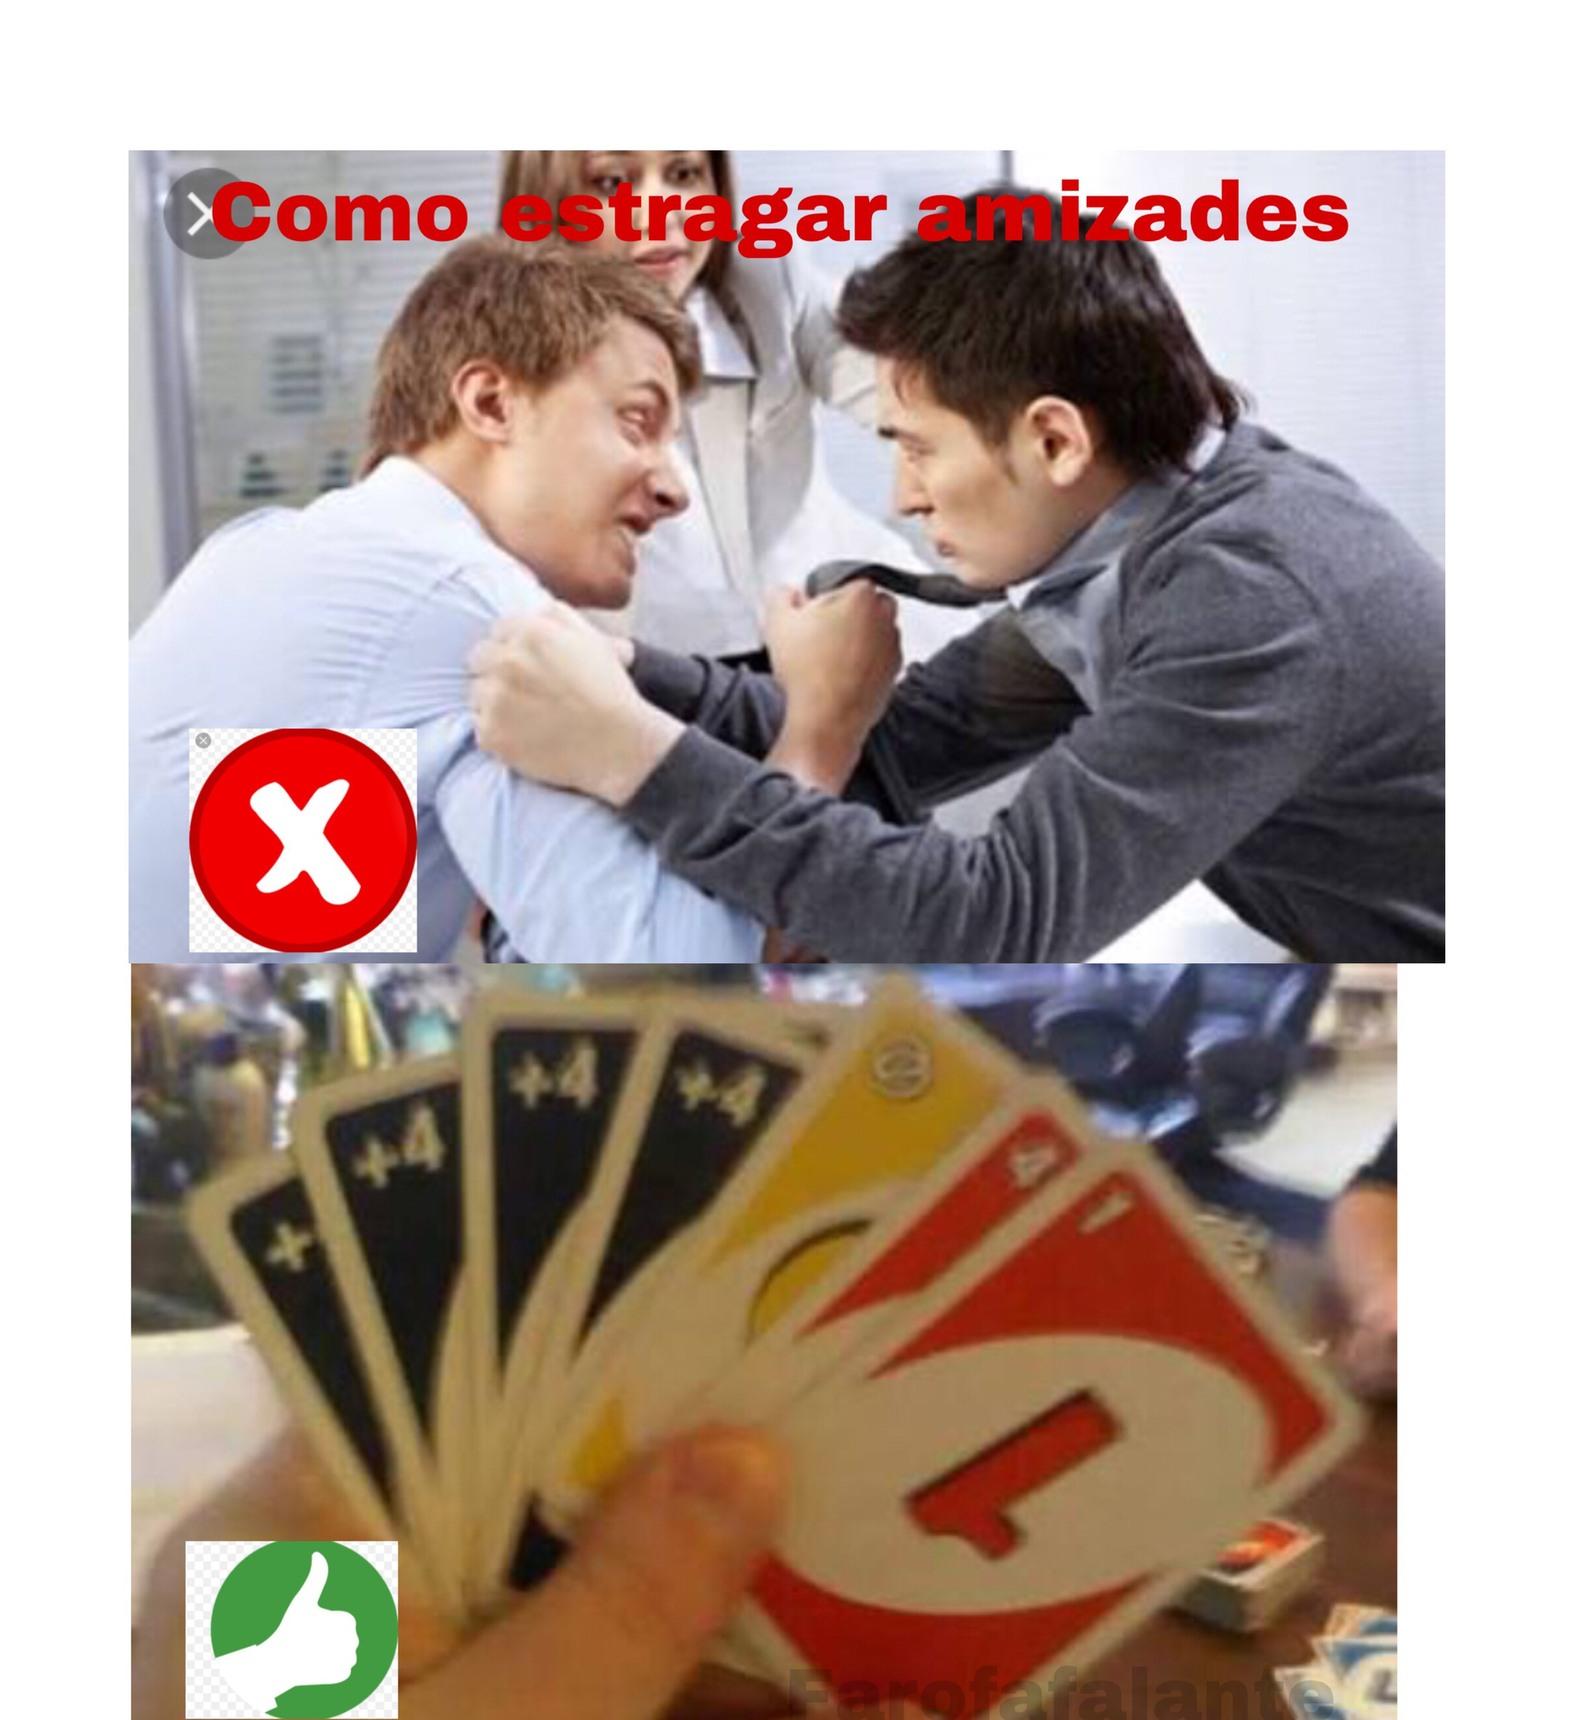 INFELIZMENTE - meme